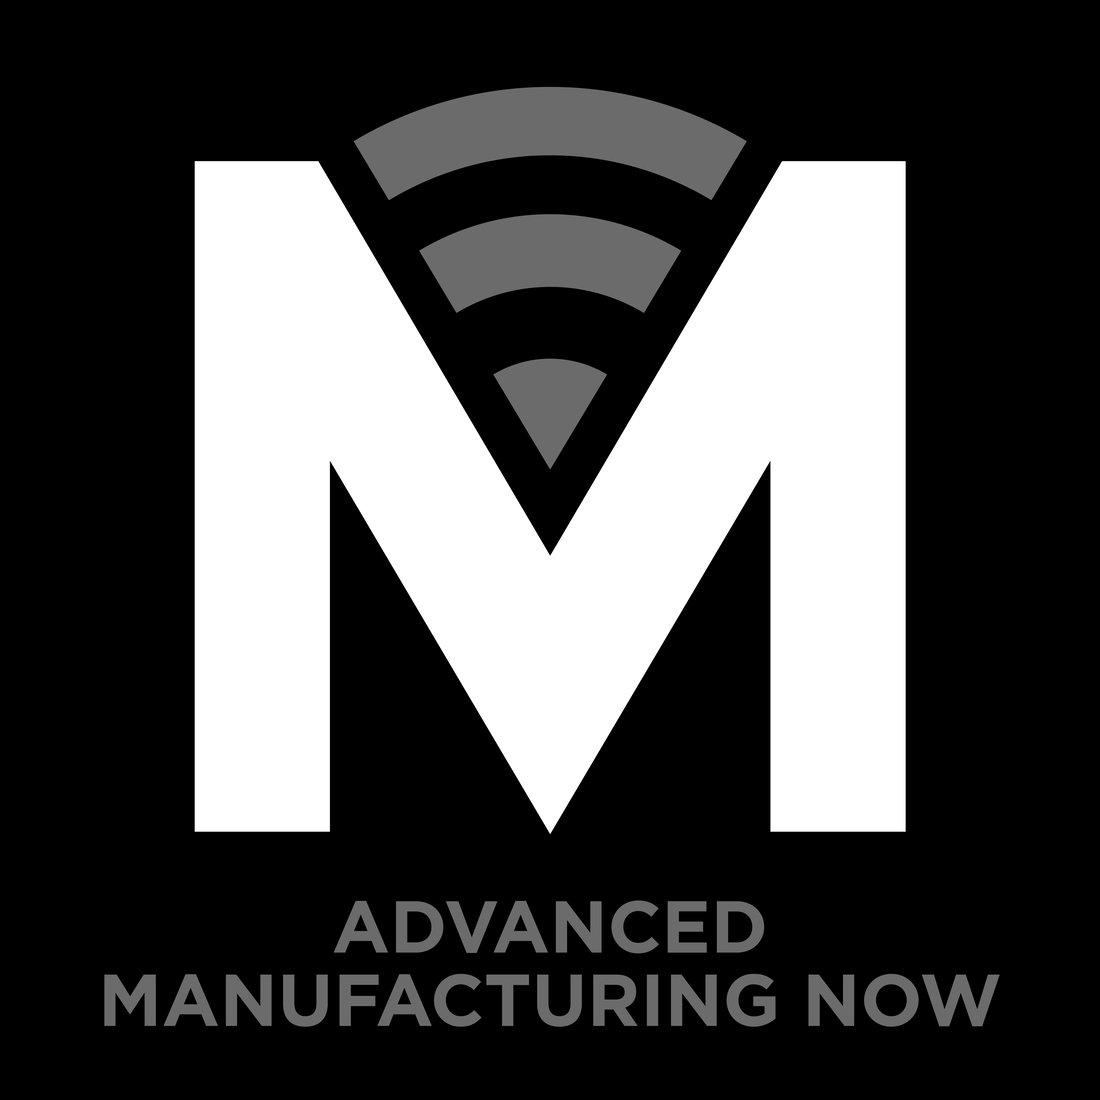 advanced manufacturing logo gray